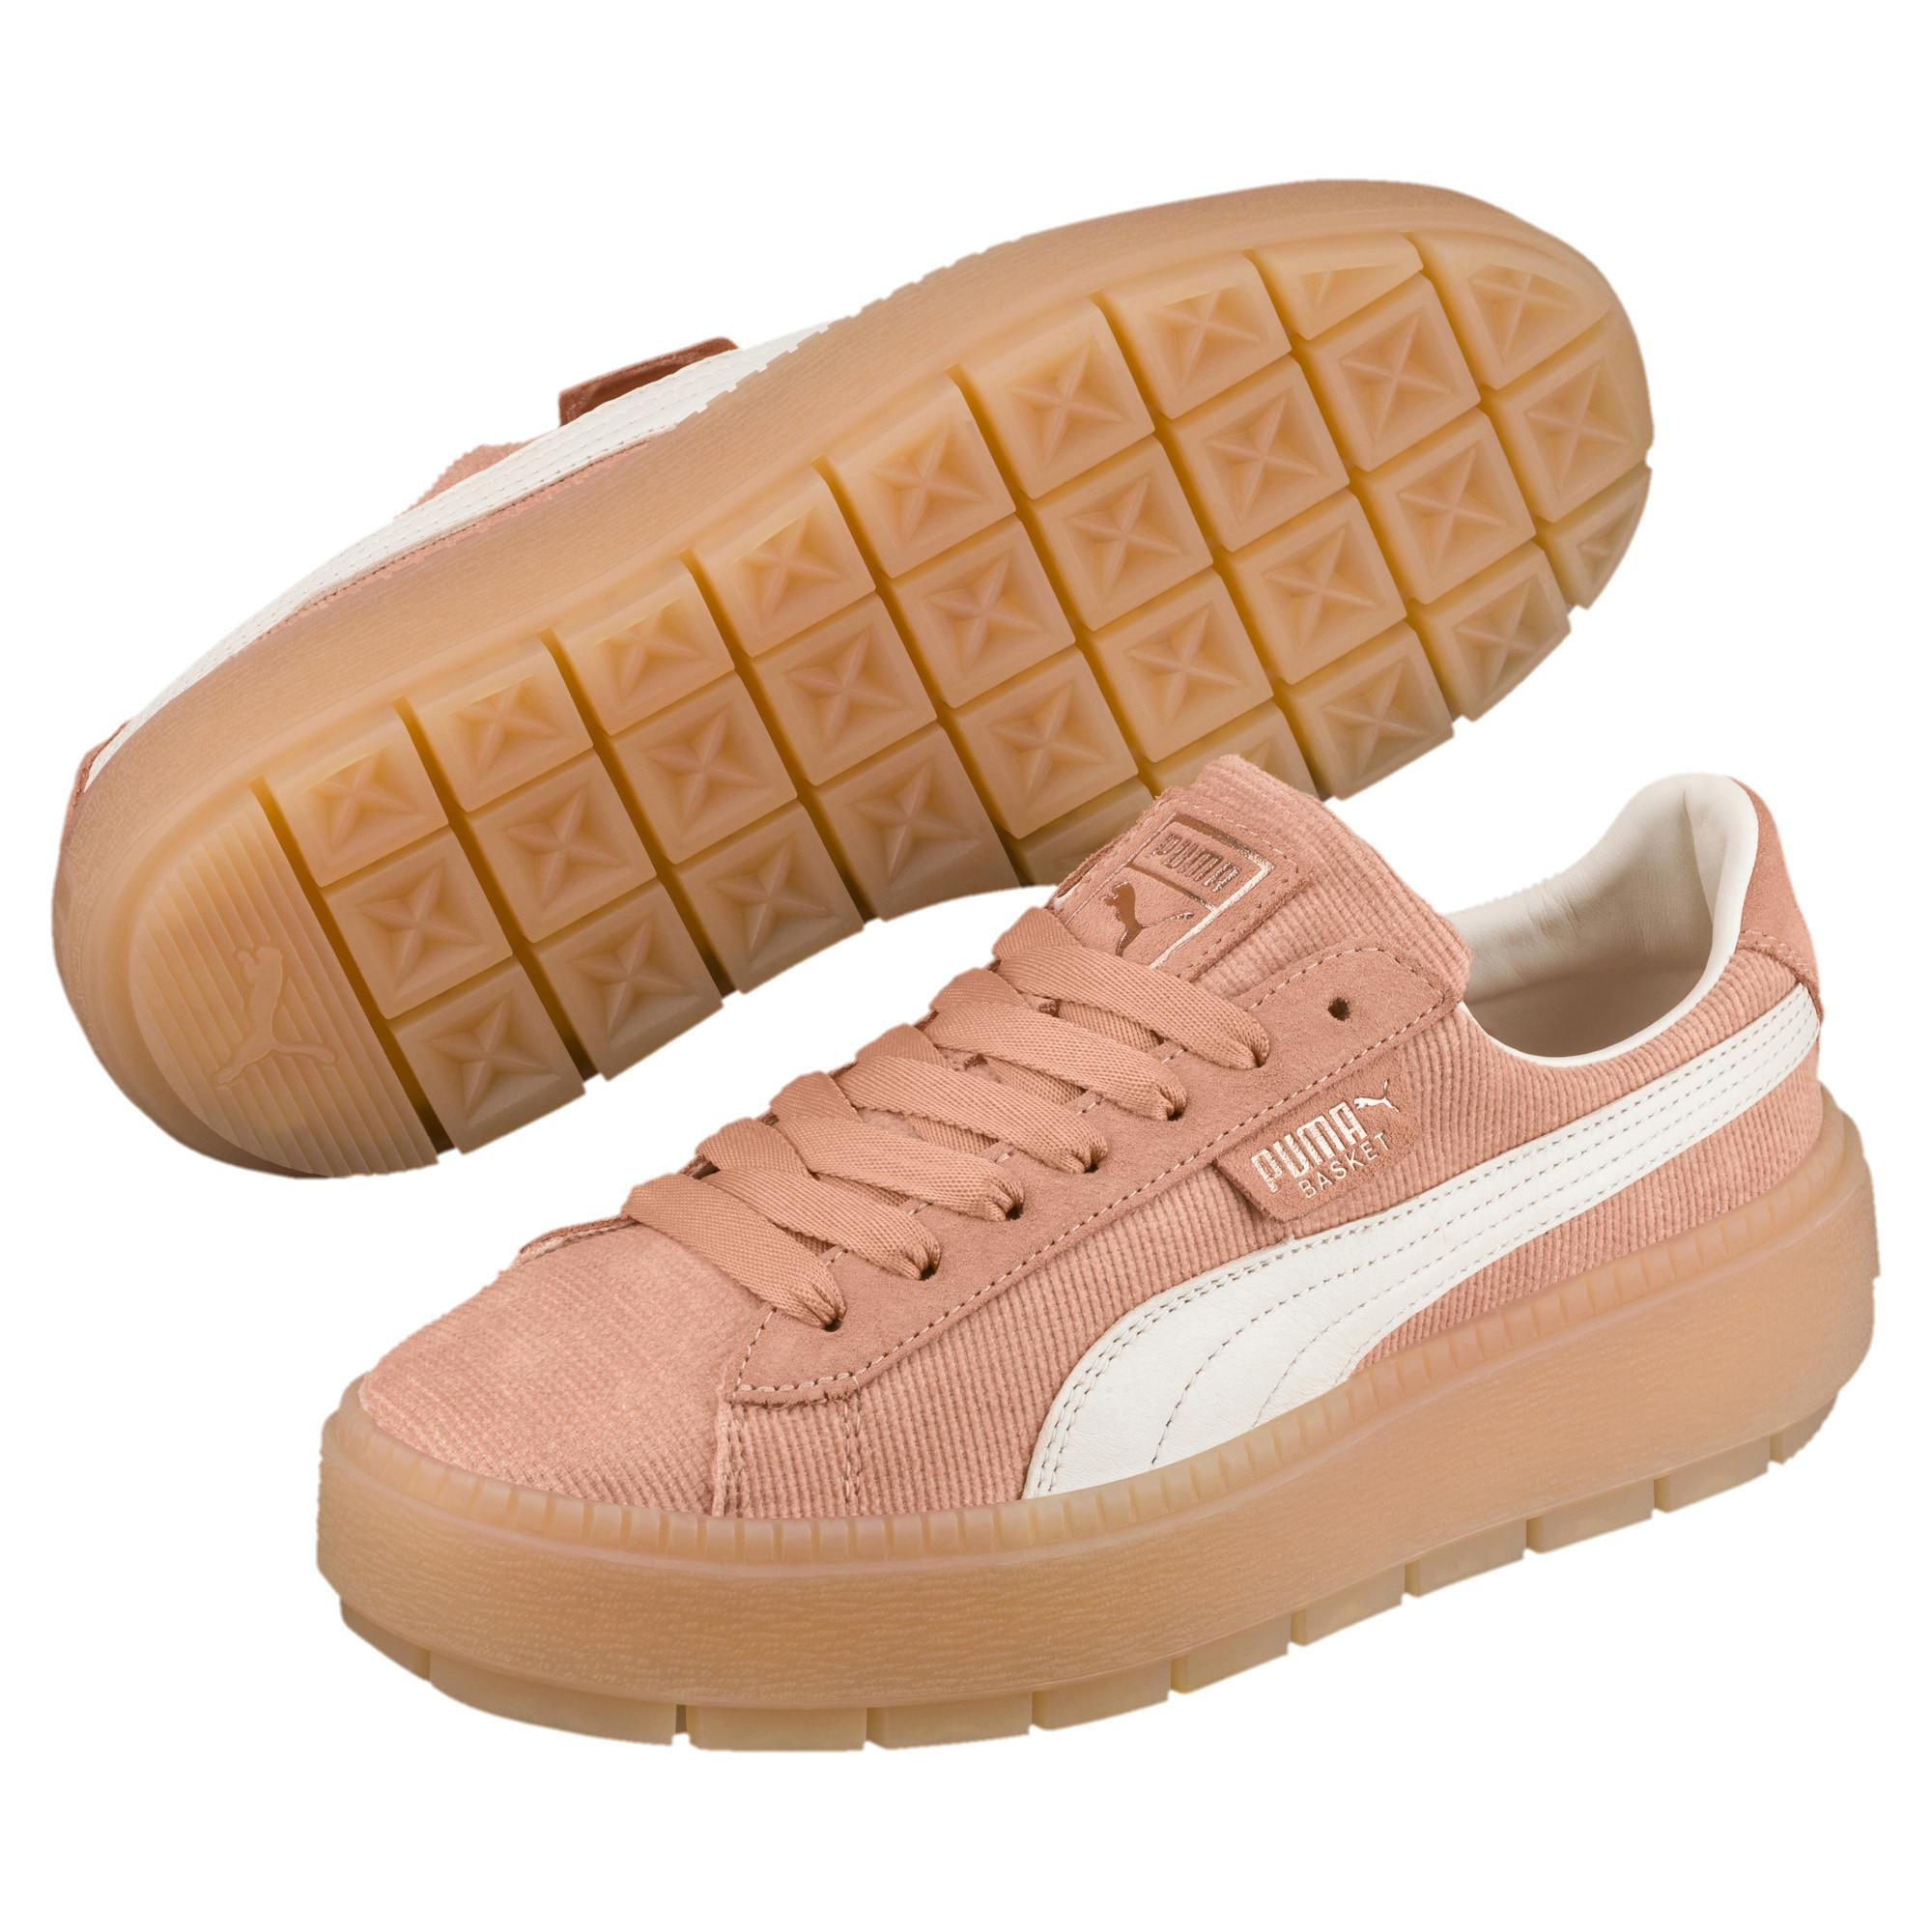 8af669bc2f22 PUMA - Multicolor Platform Trace Corduroy Women s Sneakers - Lyst. View  fullscreen